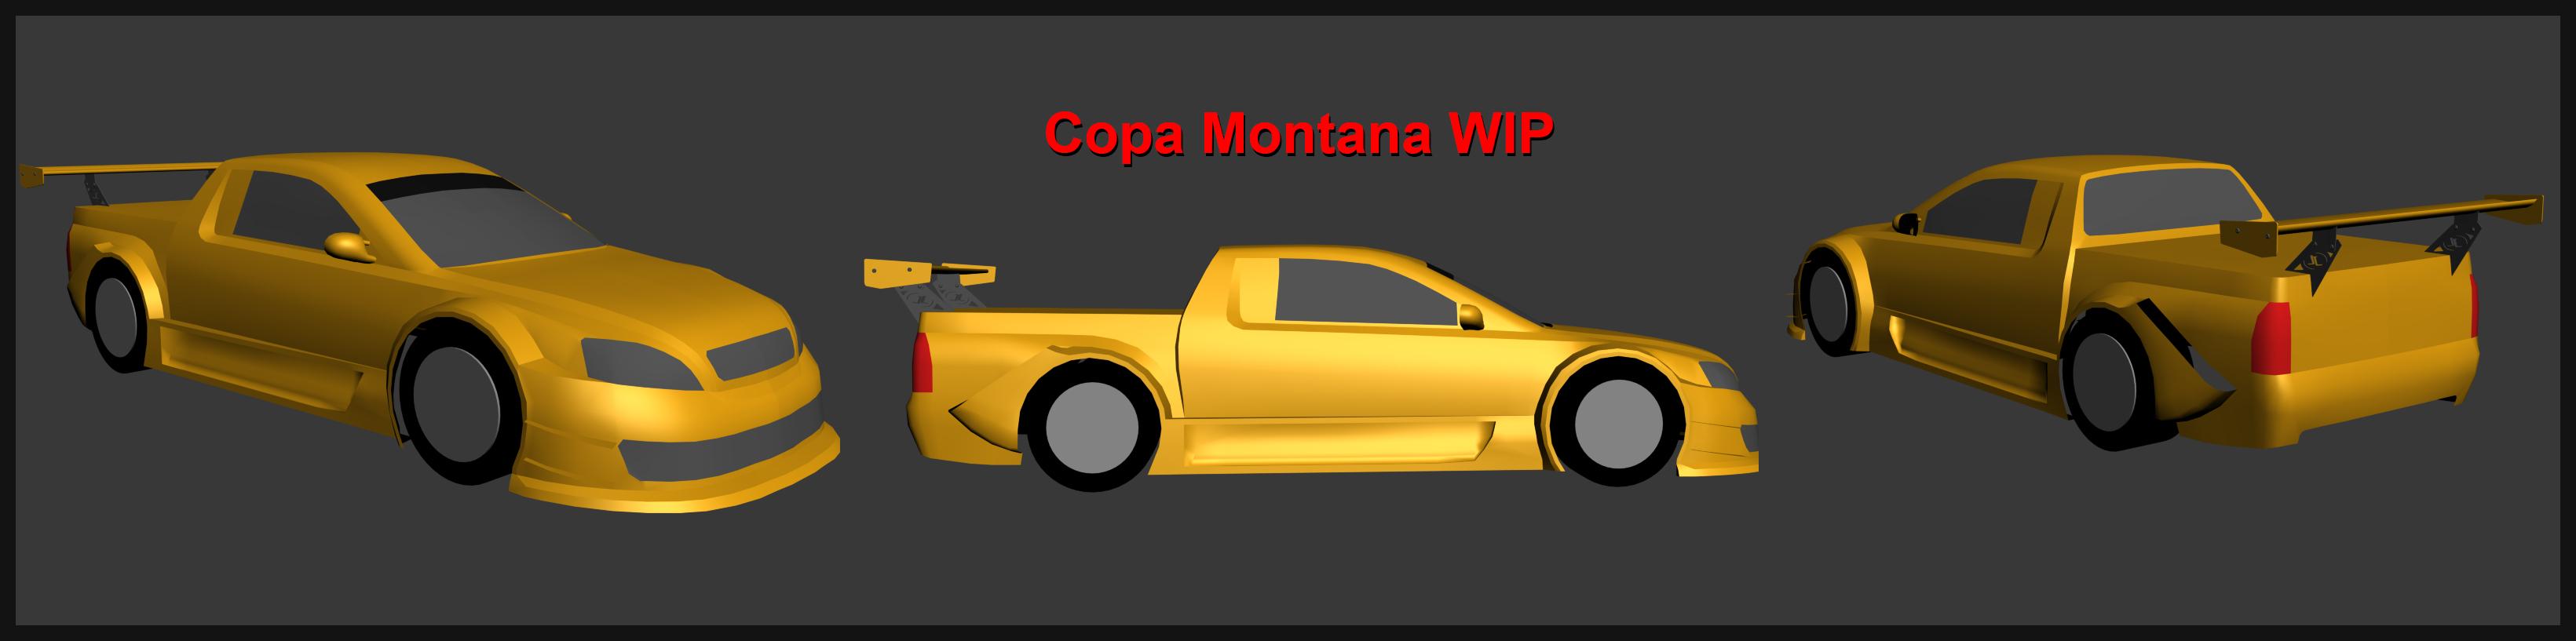 Copa_Montana_WIP_Screeenshots1.jpg